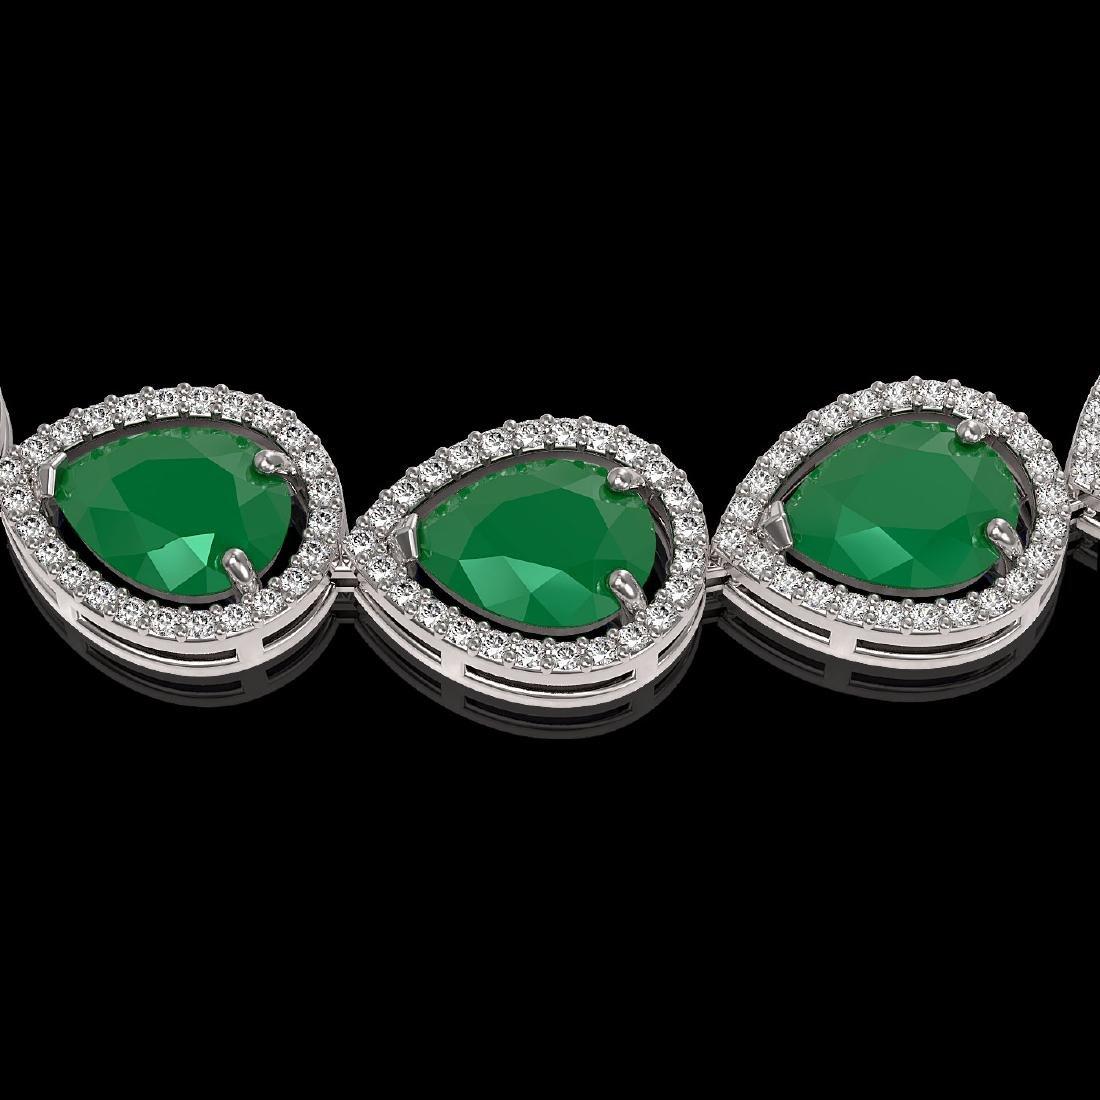 64.01 CTW Emerald & Diamond Halo Necklace 10K White - 3